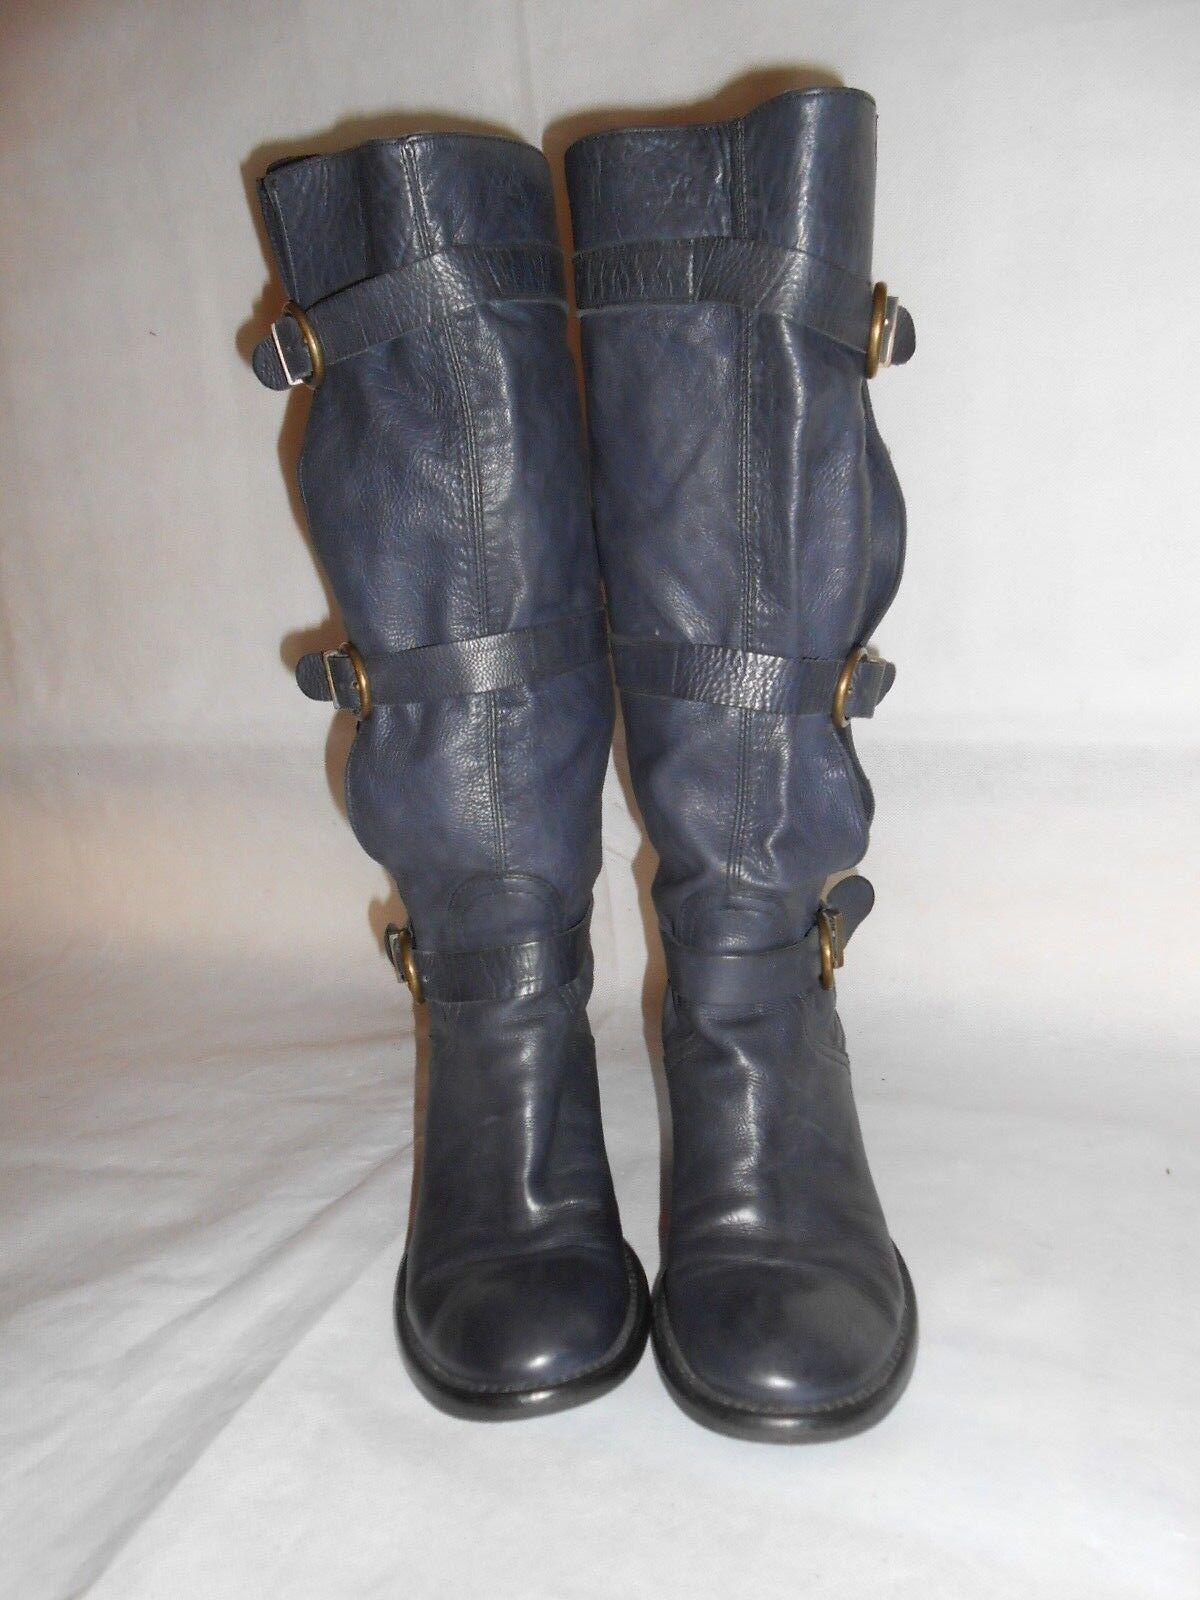 Mujeres Botas Altas Rodilla Azul Marino Marino Azul cinturones de cuero real de tacón bajo fabricación d'essai S 3.5 e3de74